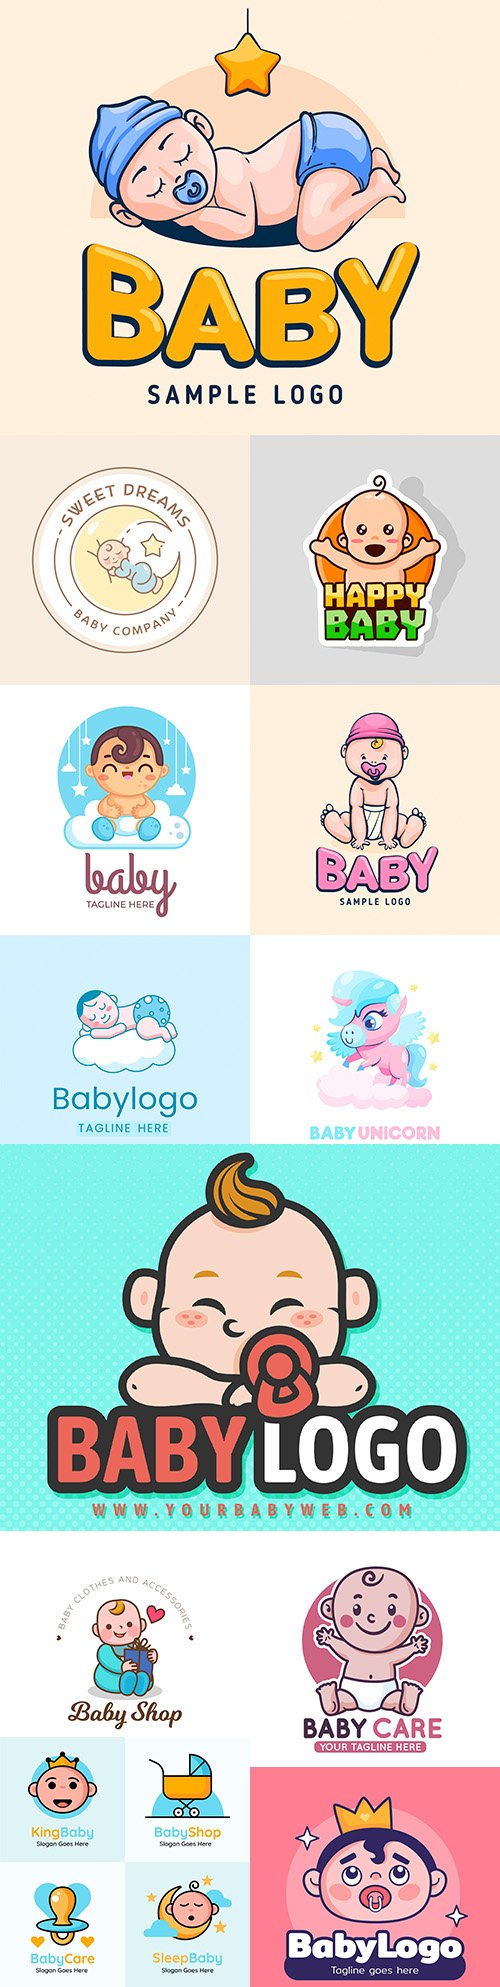 Baby brand name company logos corporate design